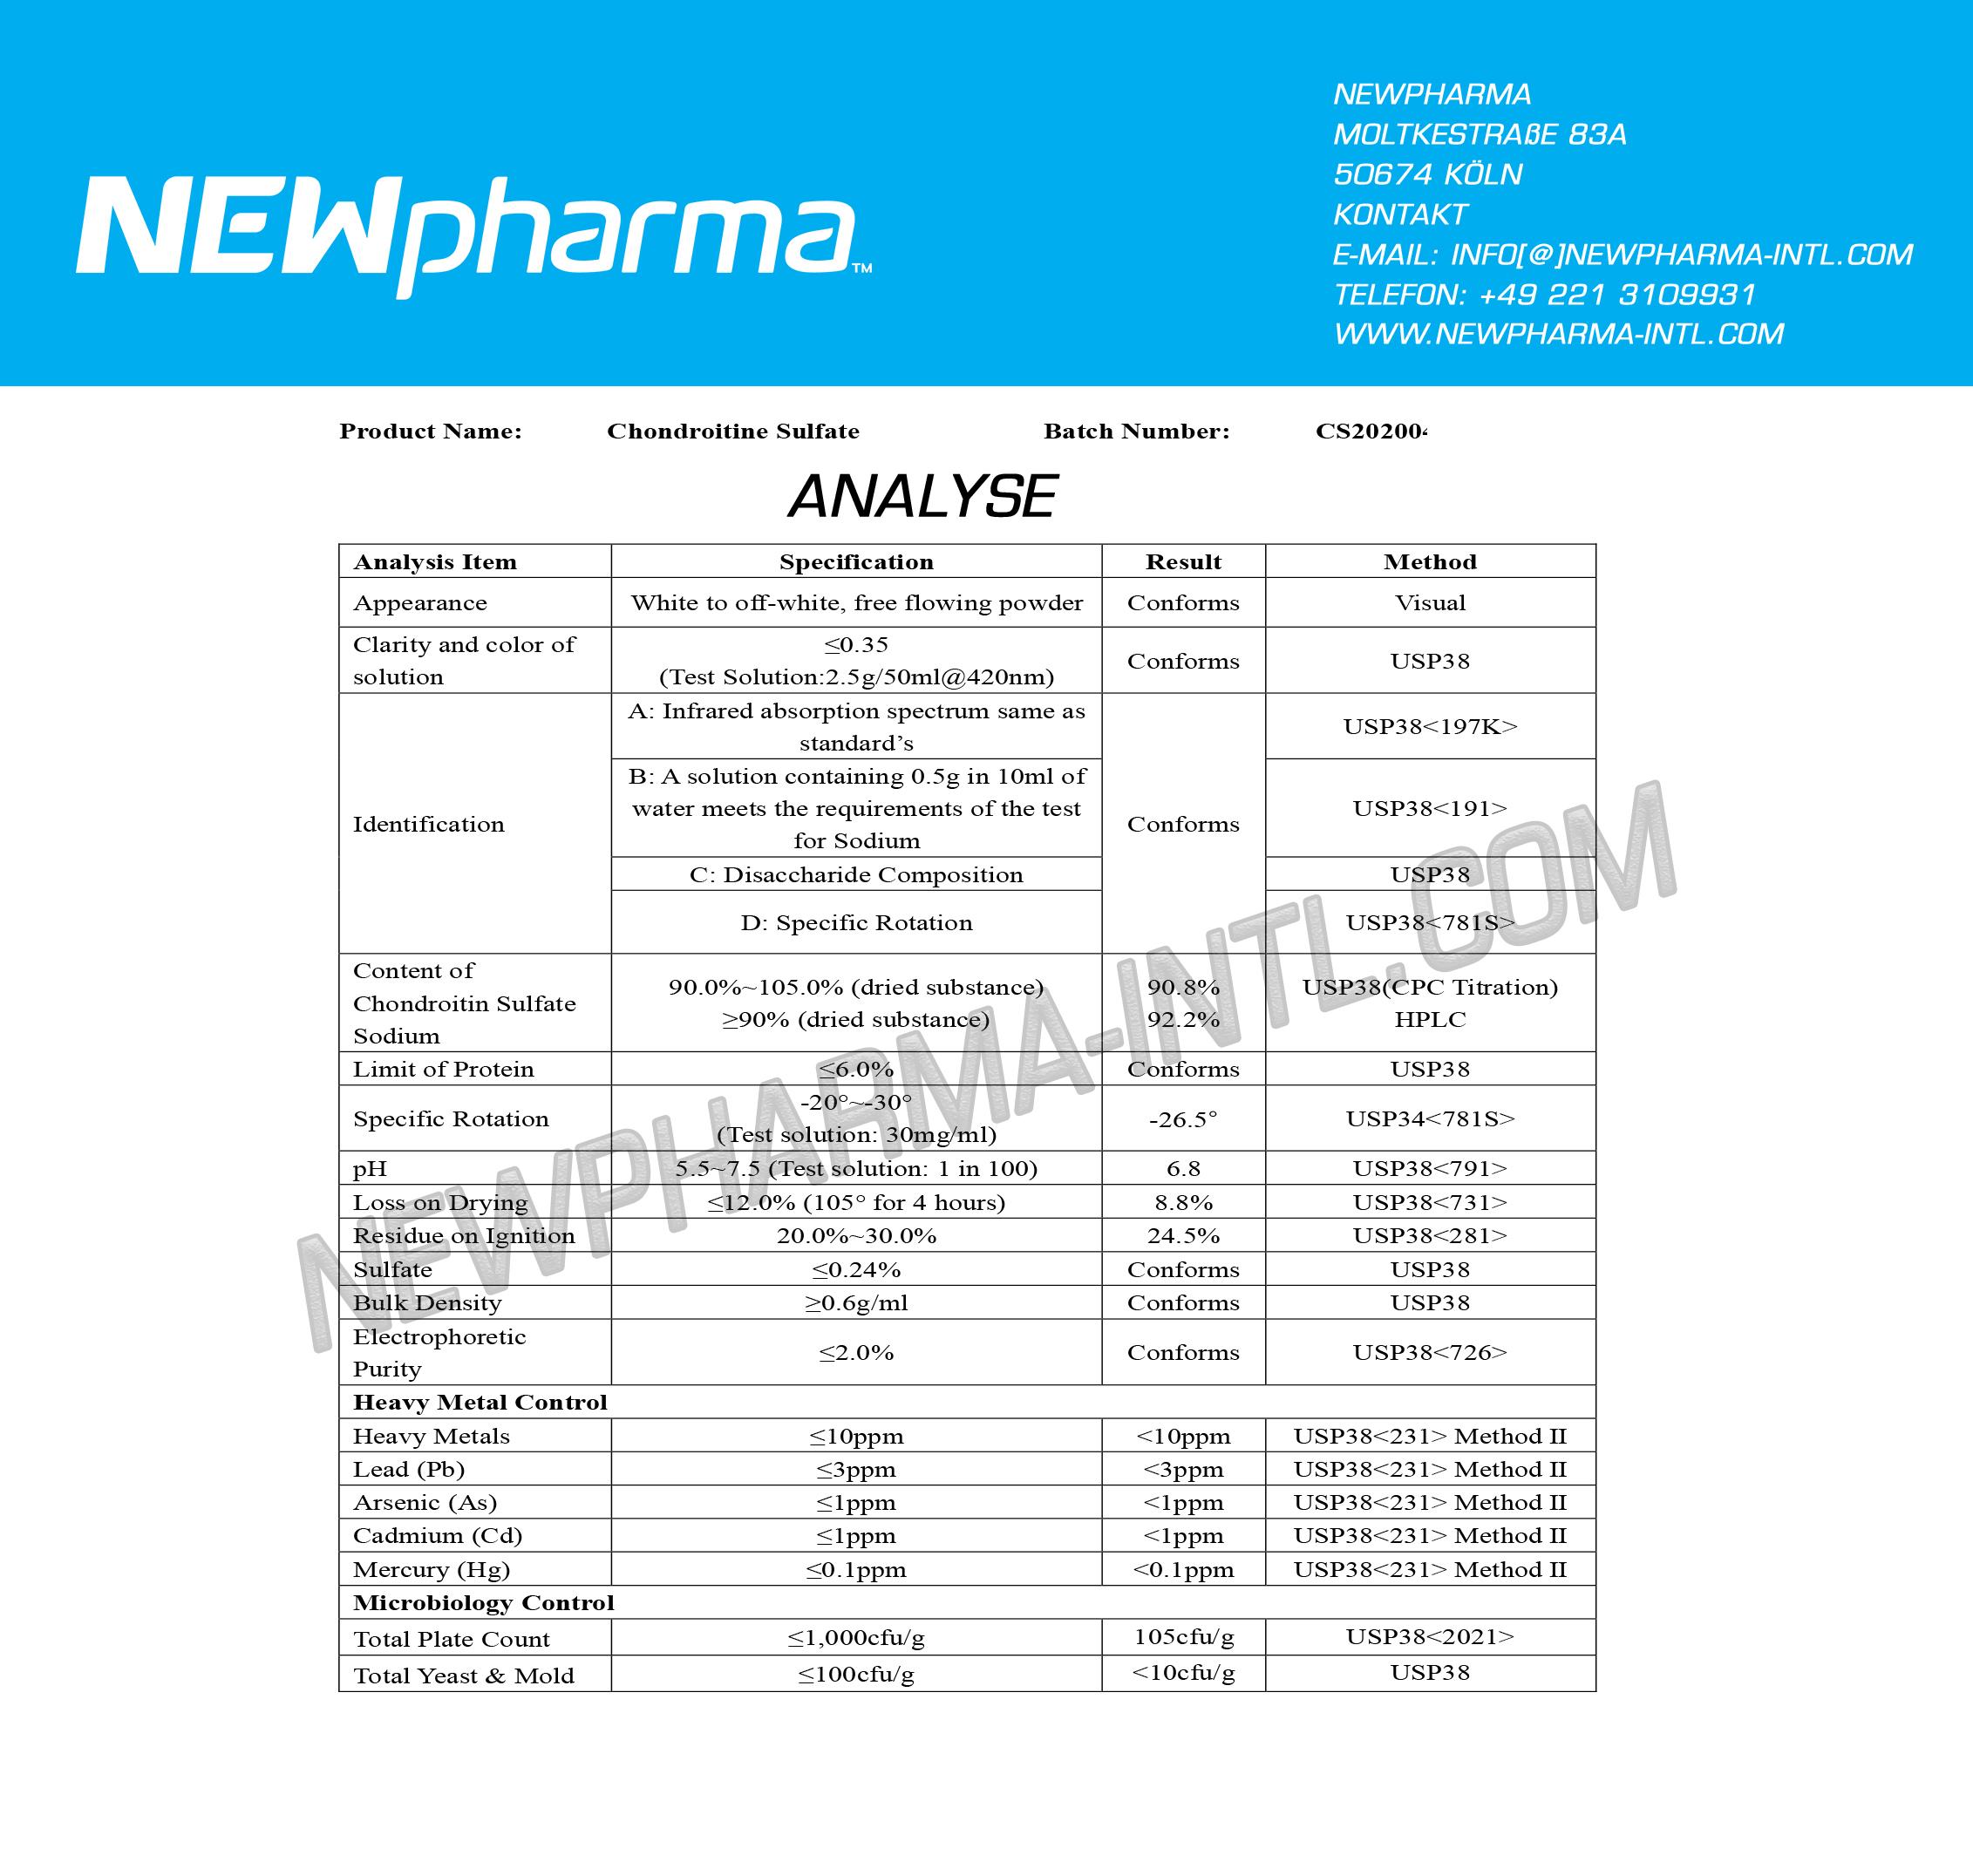 NEWPHARMA-Chondroitine-Sulfat-25CvzpV5qvGfIf